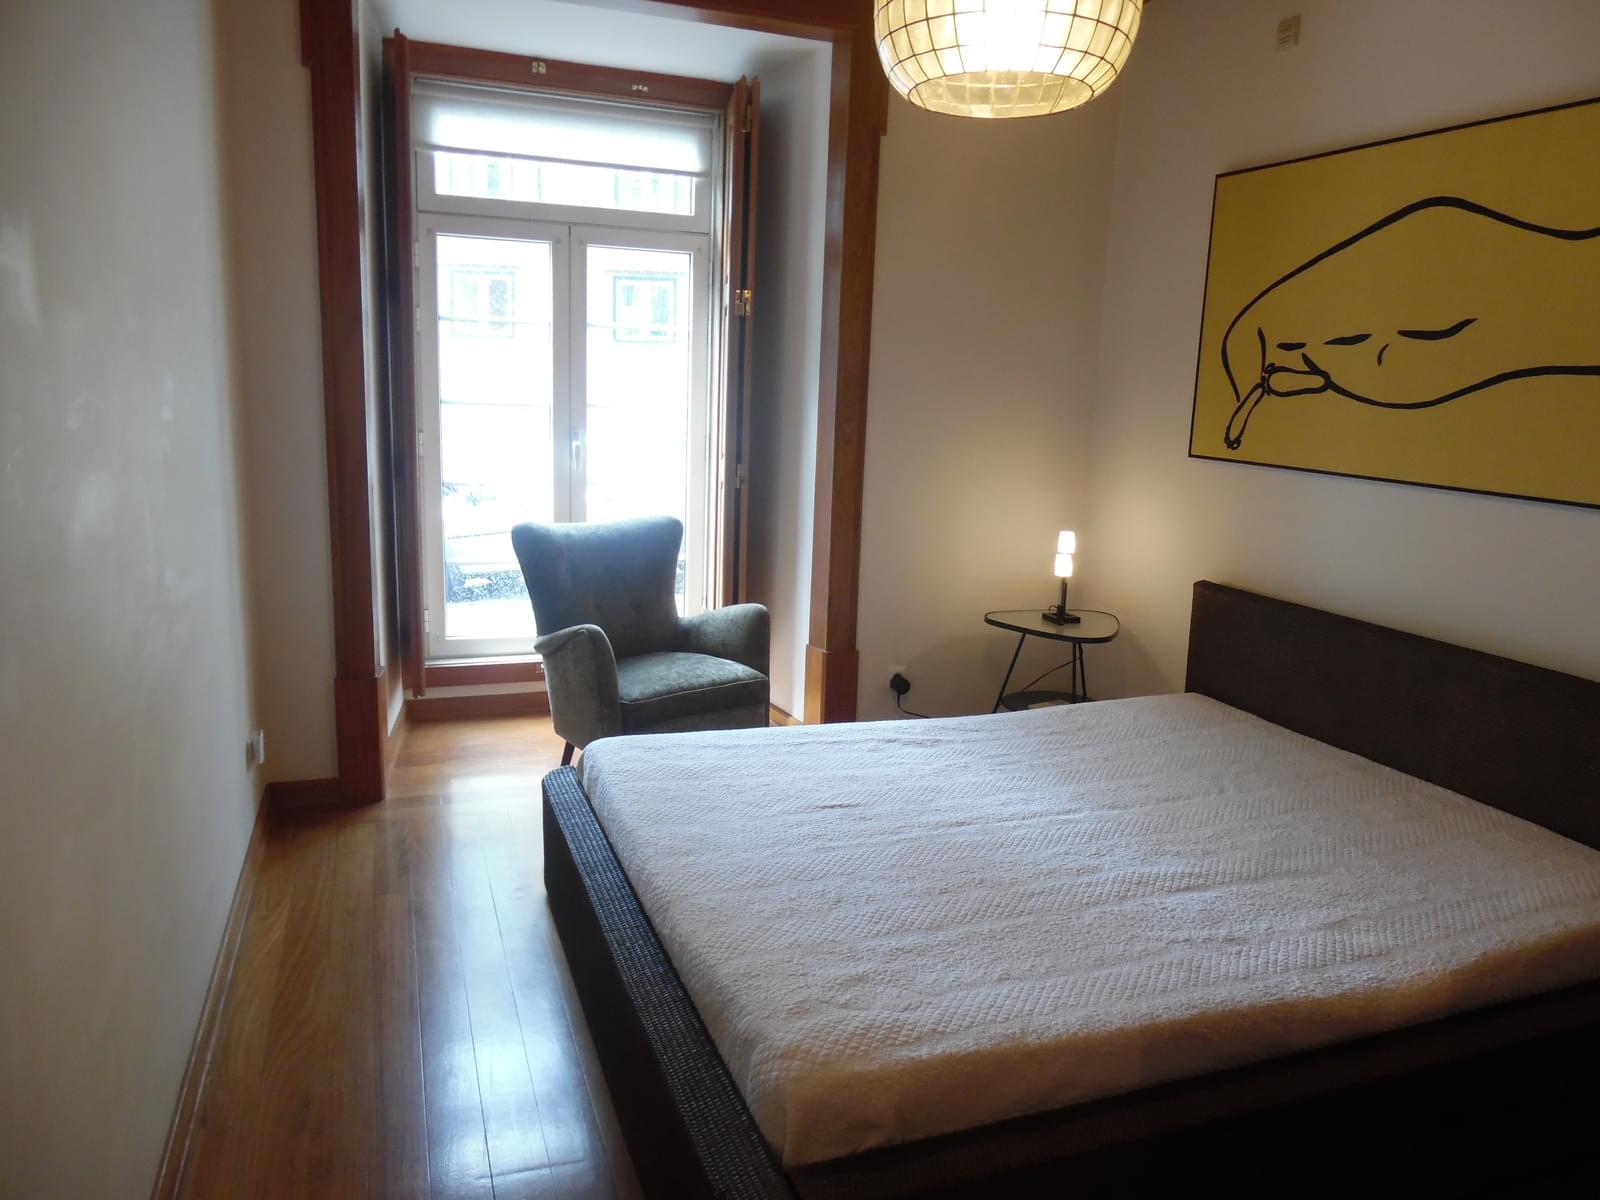 pf16905-apartamento-t1-lisboa-21aebaab-33da-4da2-88b1-da171a61992d